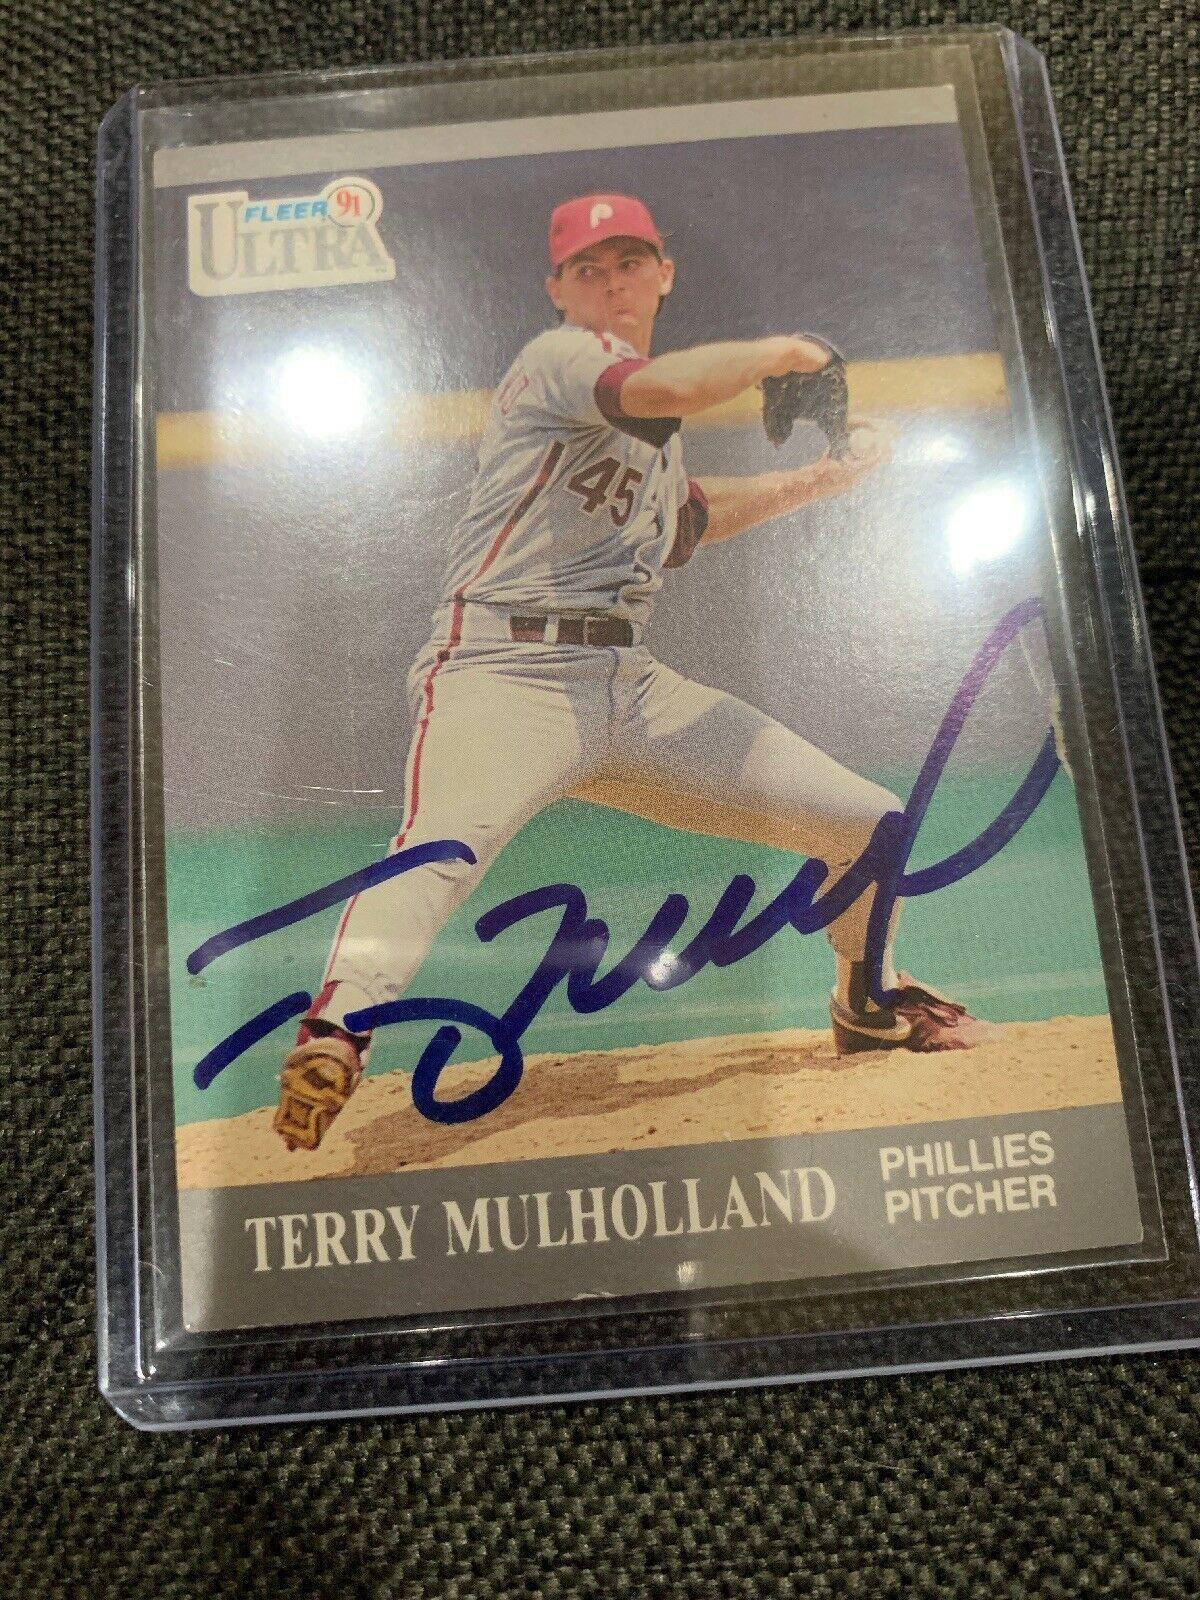 1991 Fleer Ultra #269 Terry Mulholland Phila Phillies Card Auto Hand Signed